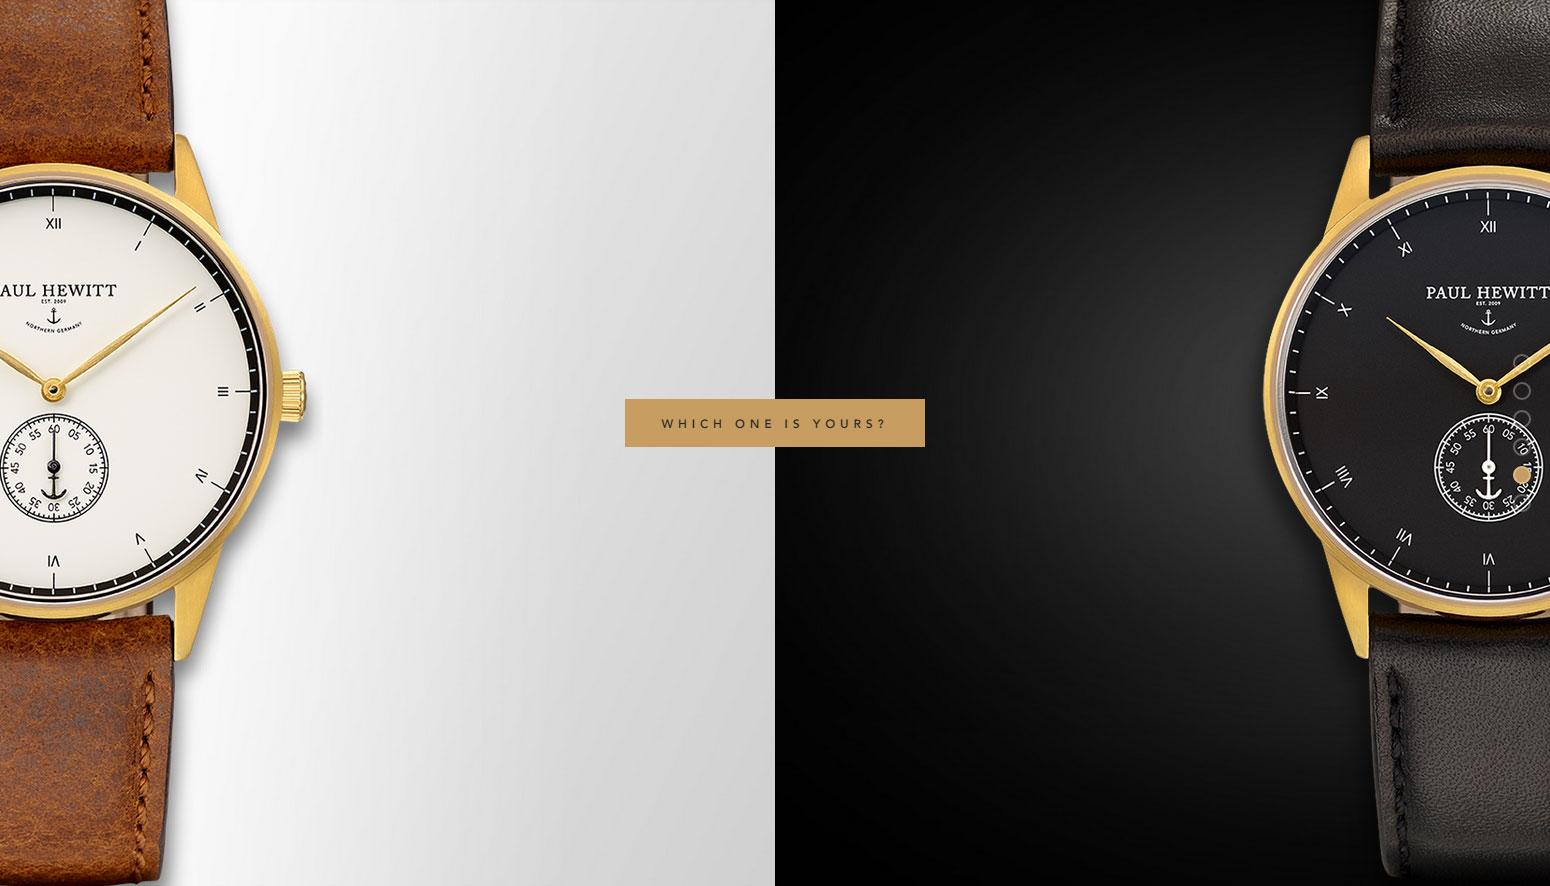 Signature Line - PAUL HEWITT - Website of the Day